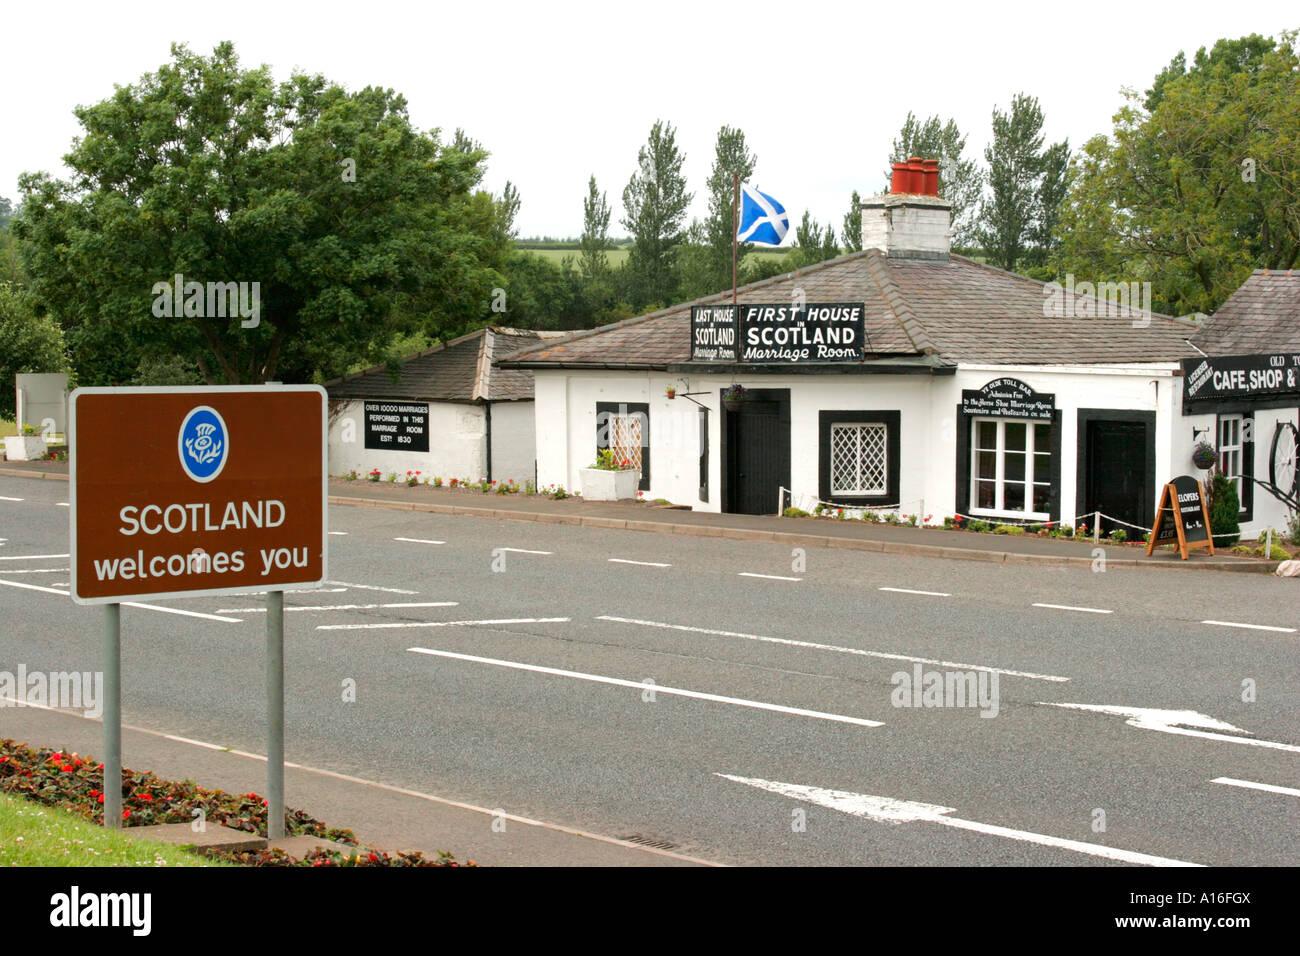 First House Last House in Scotland Gretna Green on Scotland England border Stock Photo